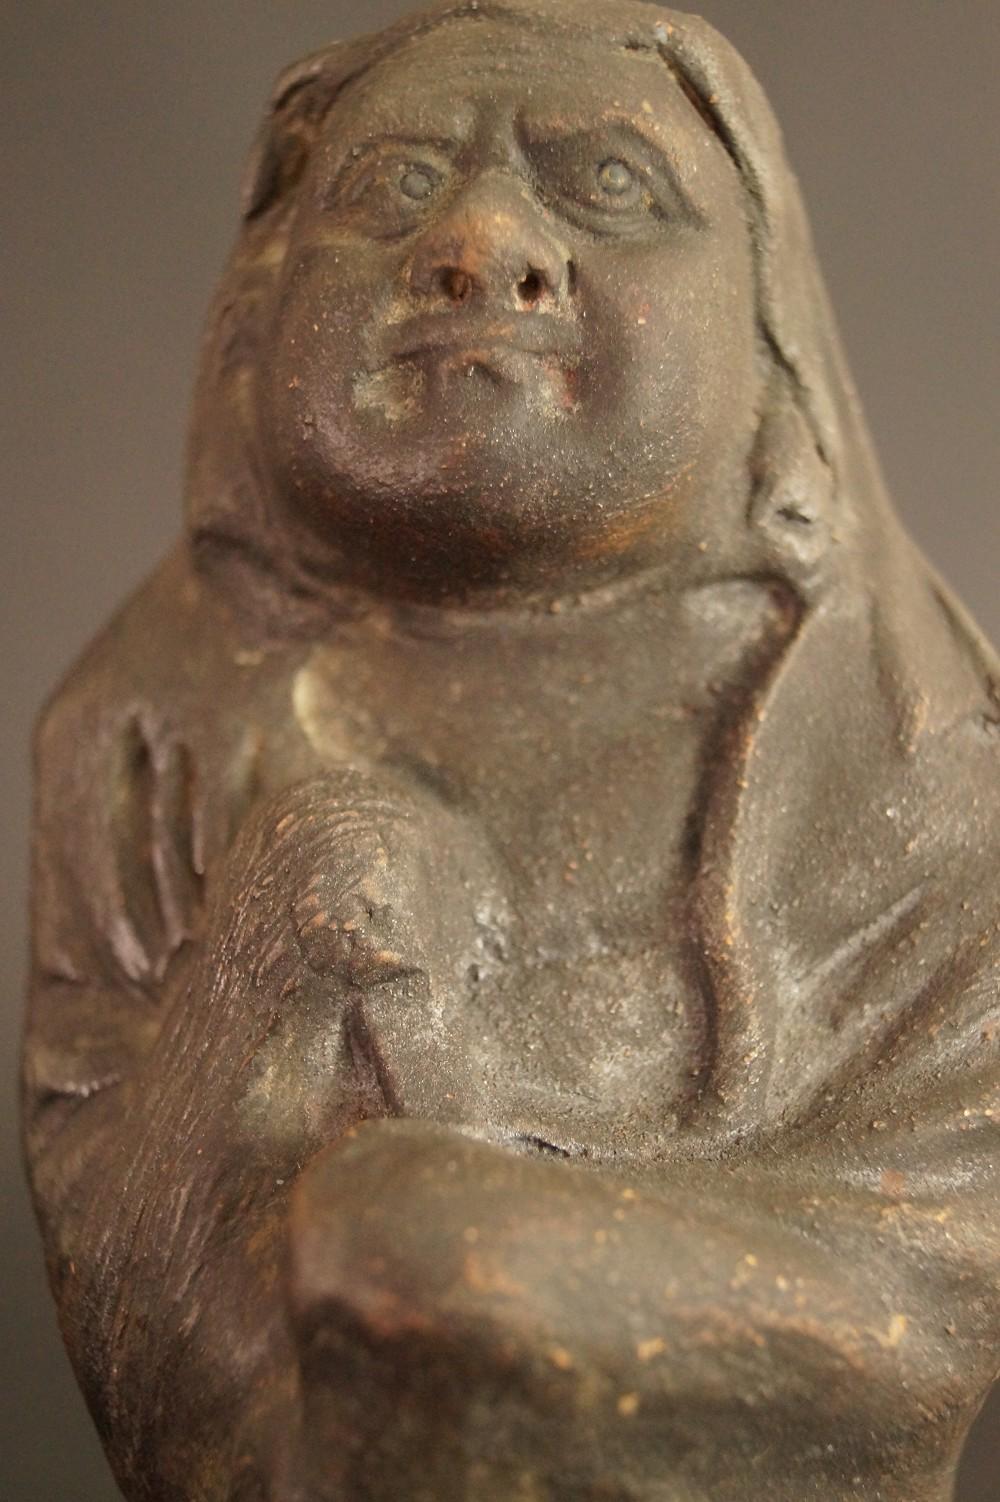 Japanische Bodhidharma (Daruma) Figur aus Keramik